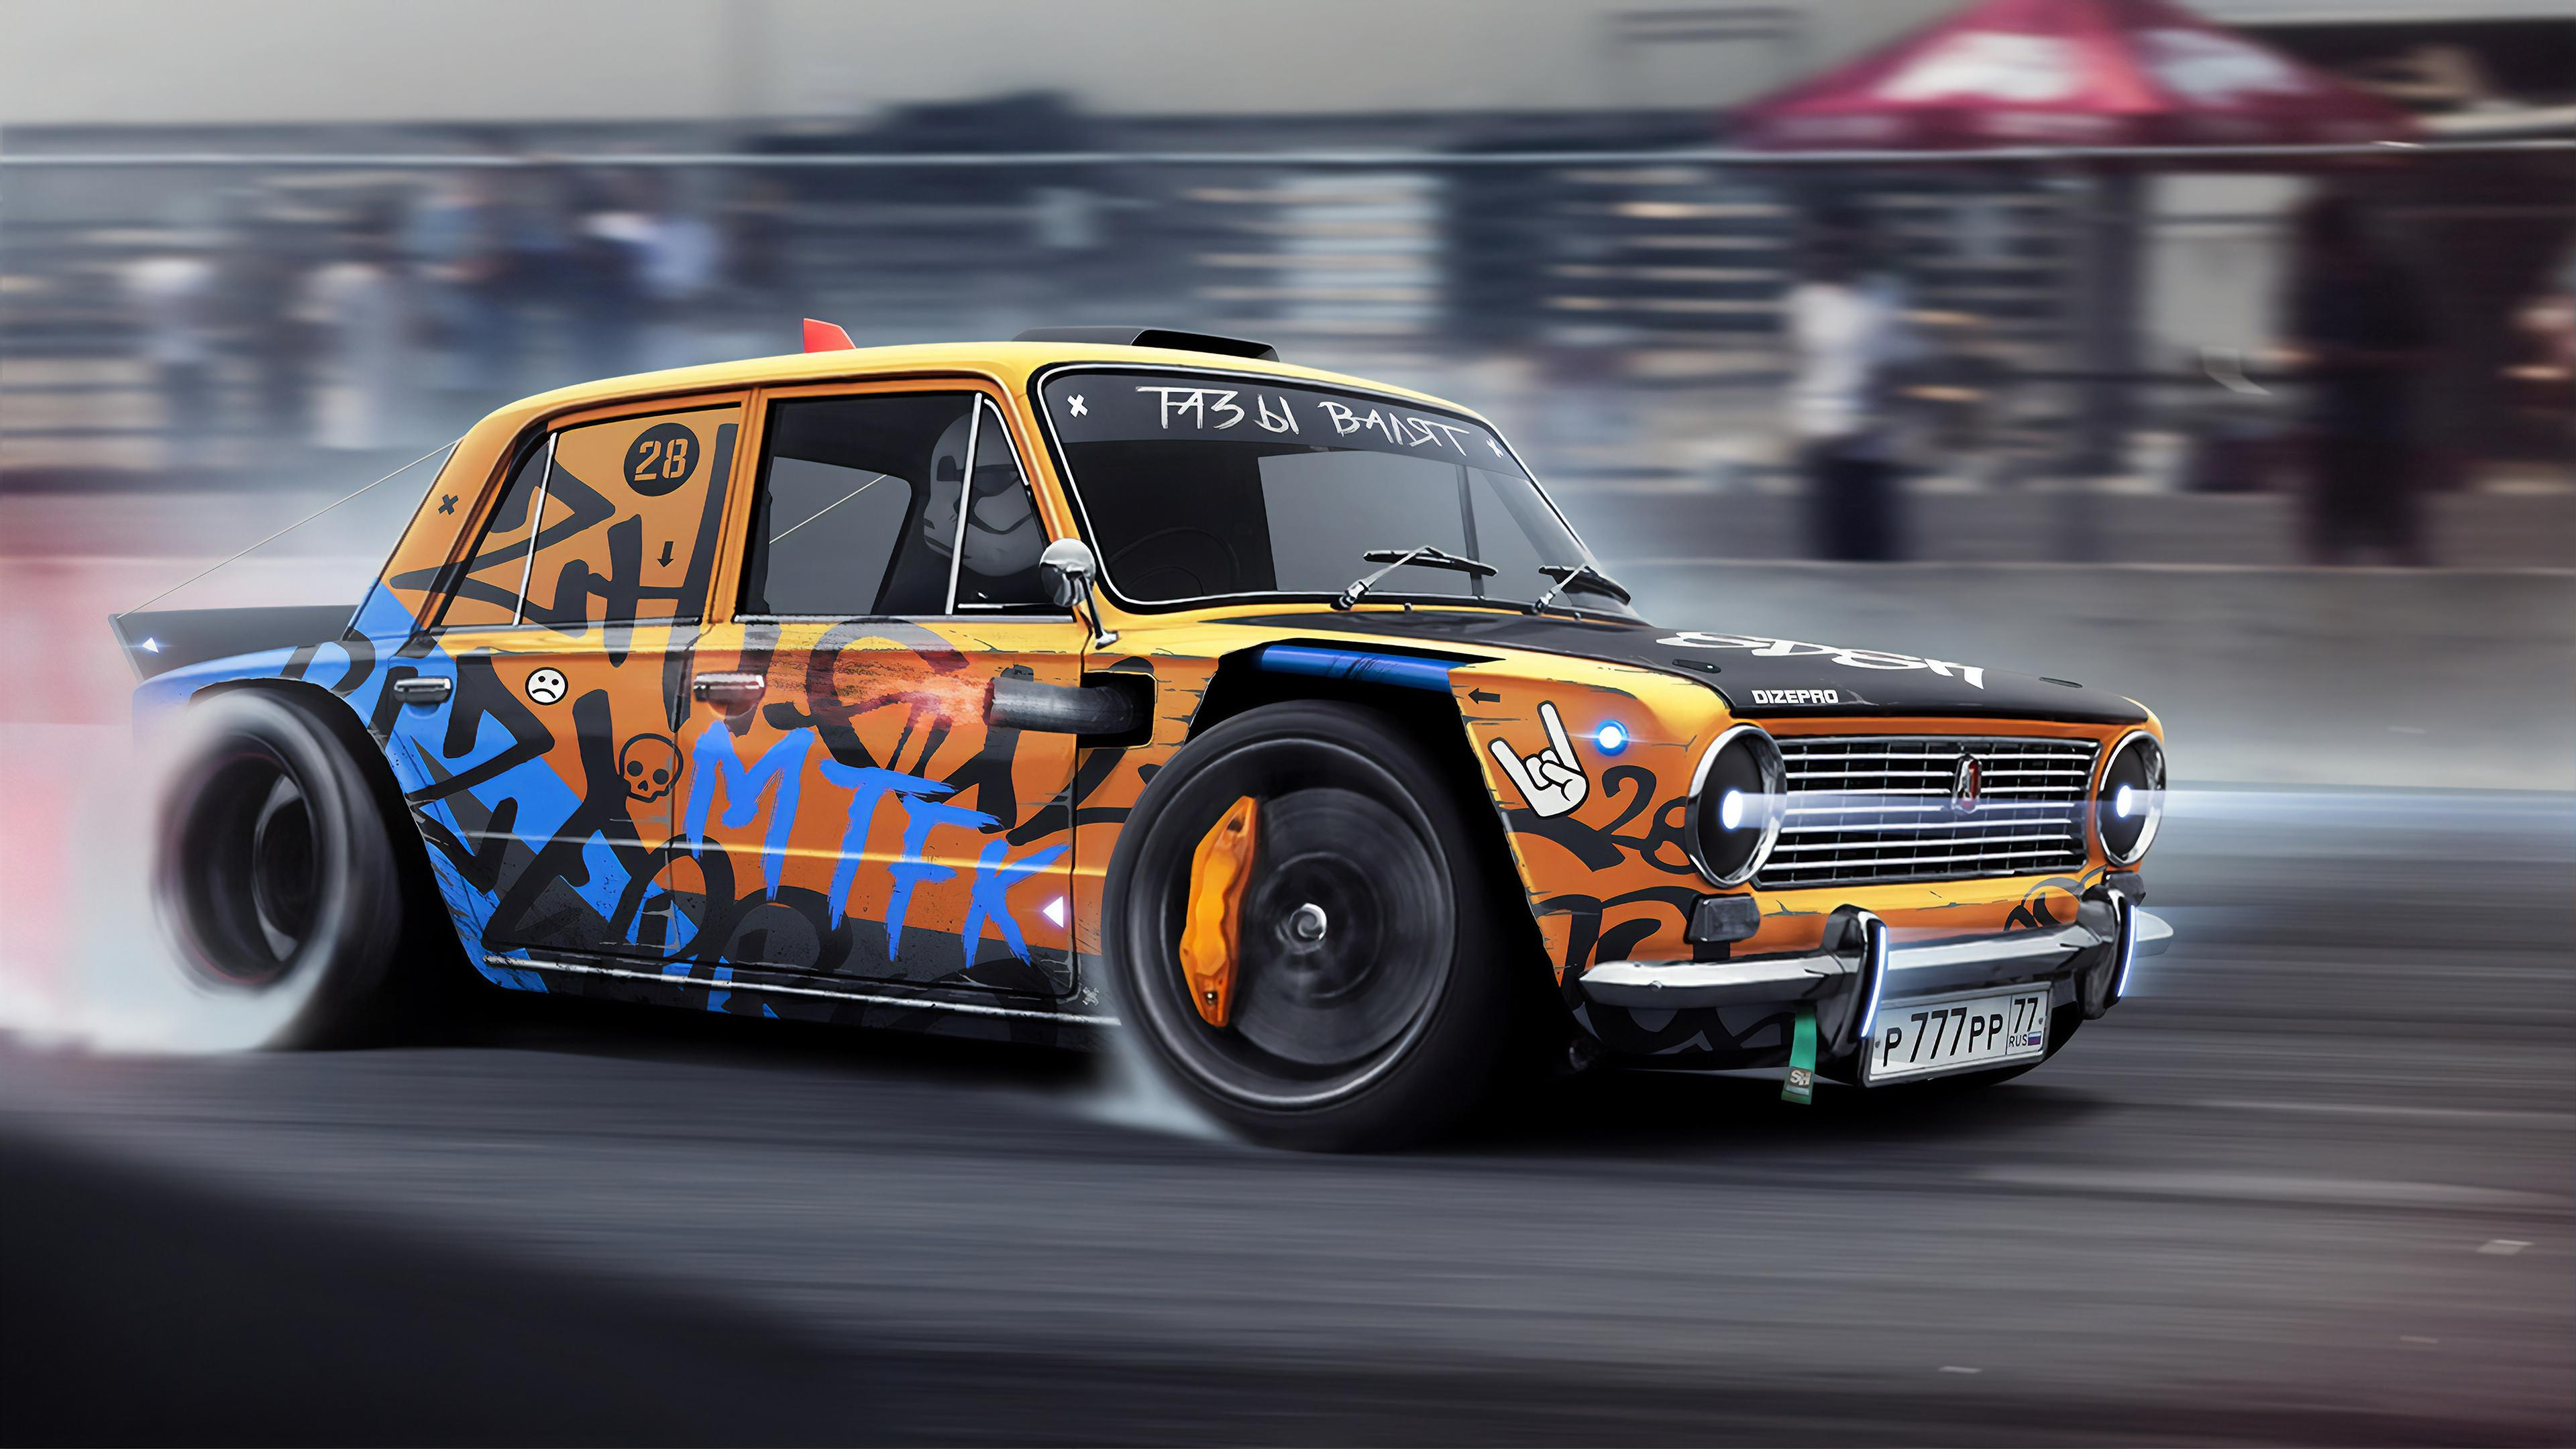 drift monster 1570919234 - Drift Monster - hd-wallpapers, drifting cars wallpapers, digital art wallpapers, cars wallpapers, artwork wallpapers, artstation wallpapers, artist wallpapers, 4k-wallpapers